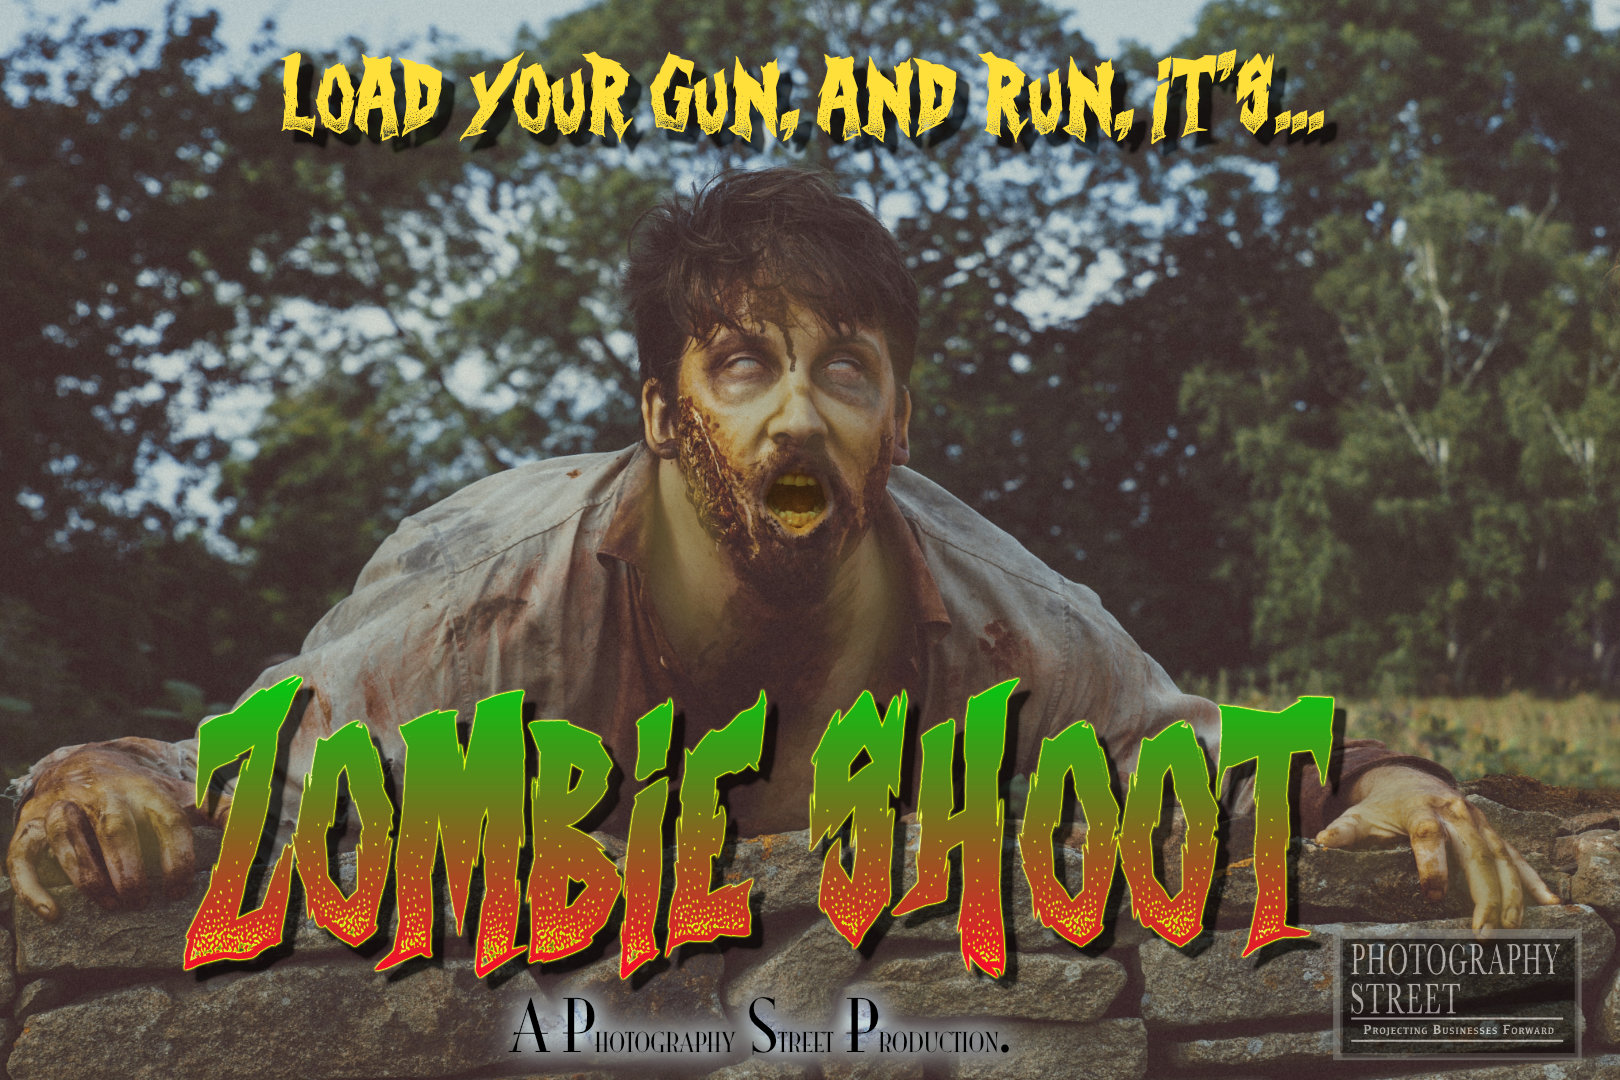 Zombie Shoot movie poster